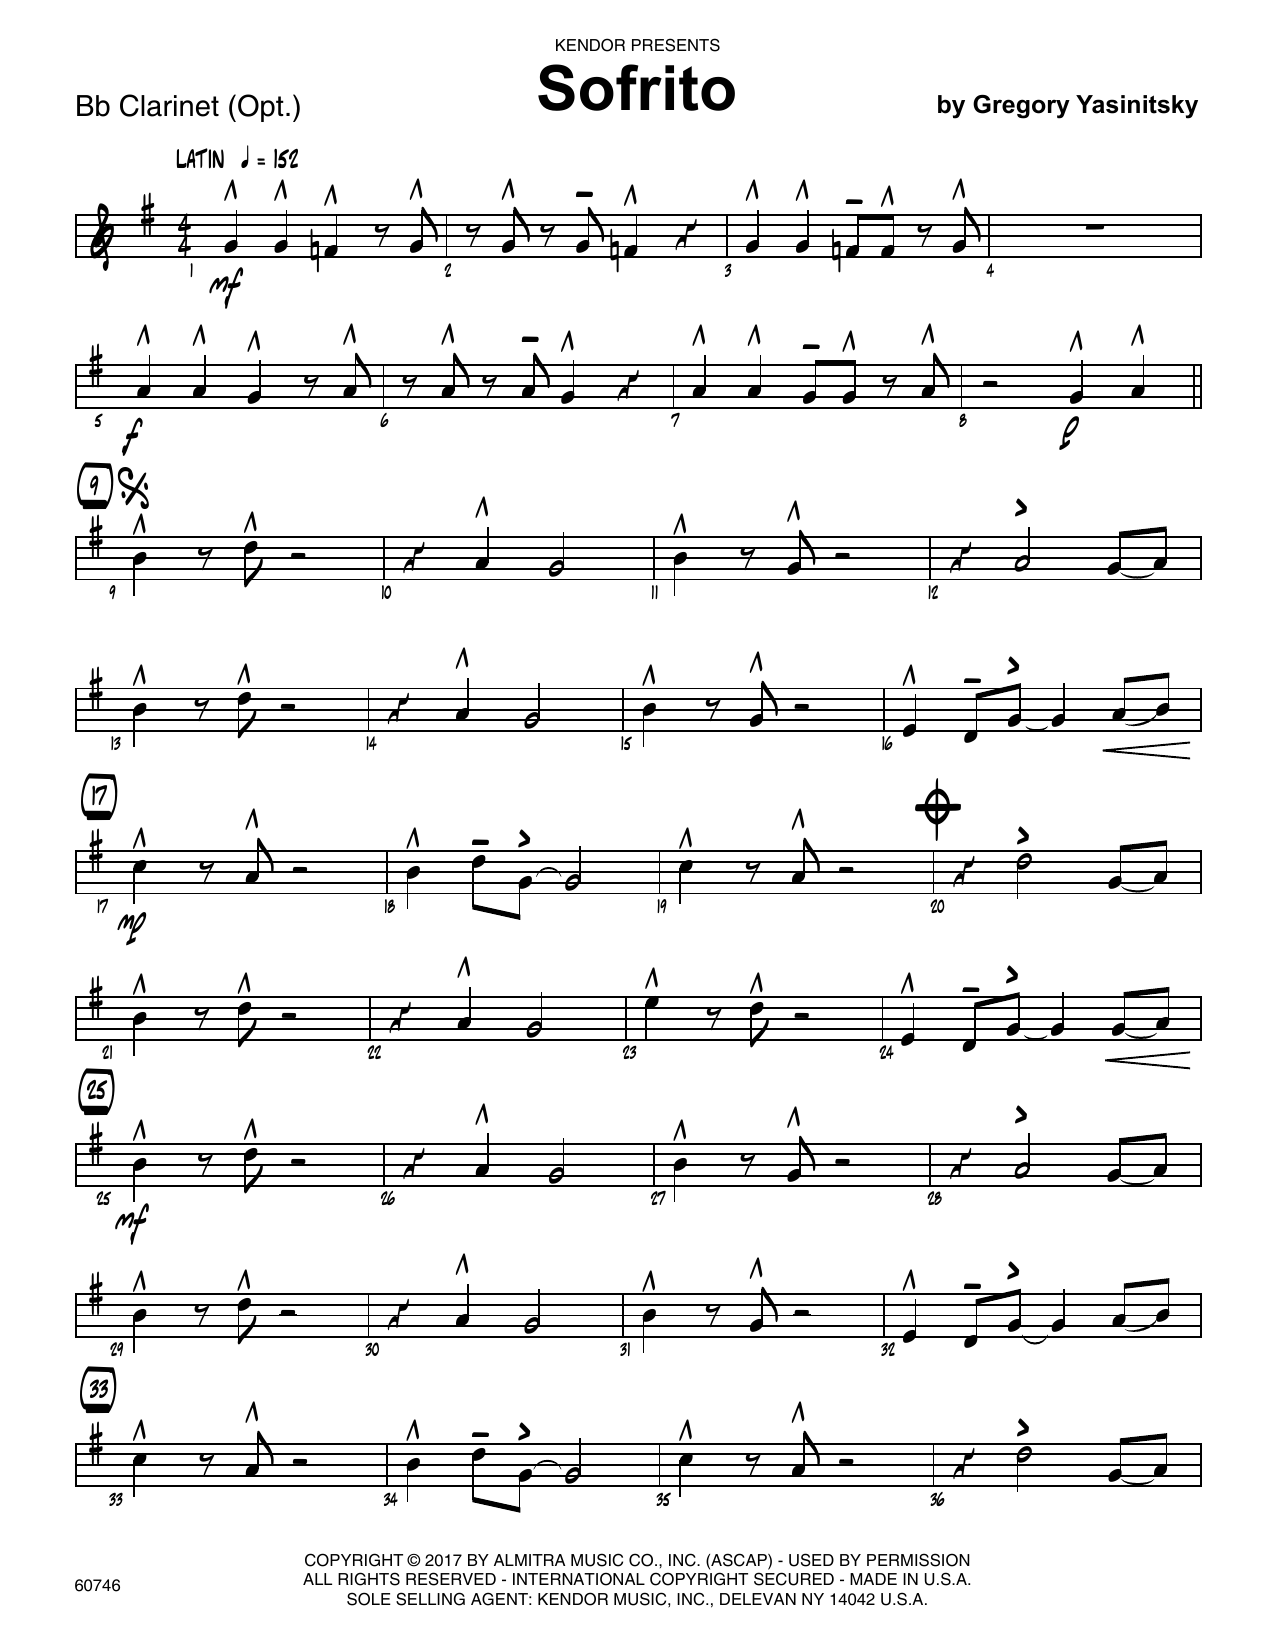 Sofrito - Bb Clarinet Sheet Music